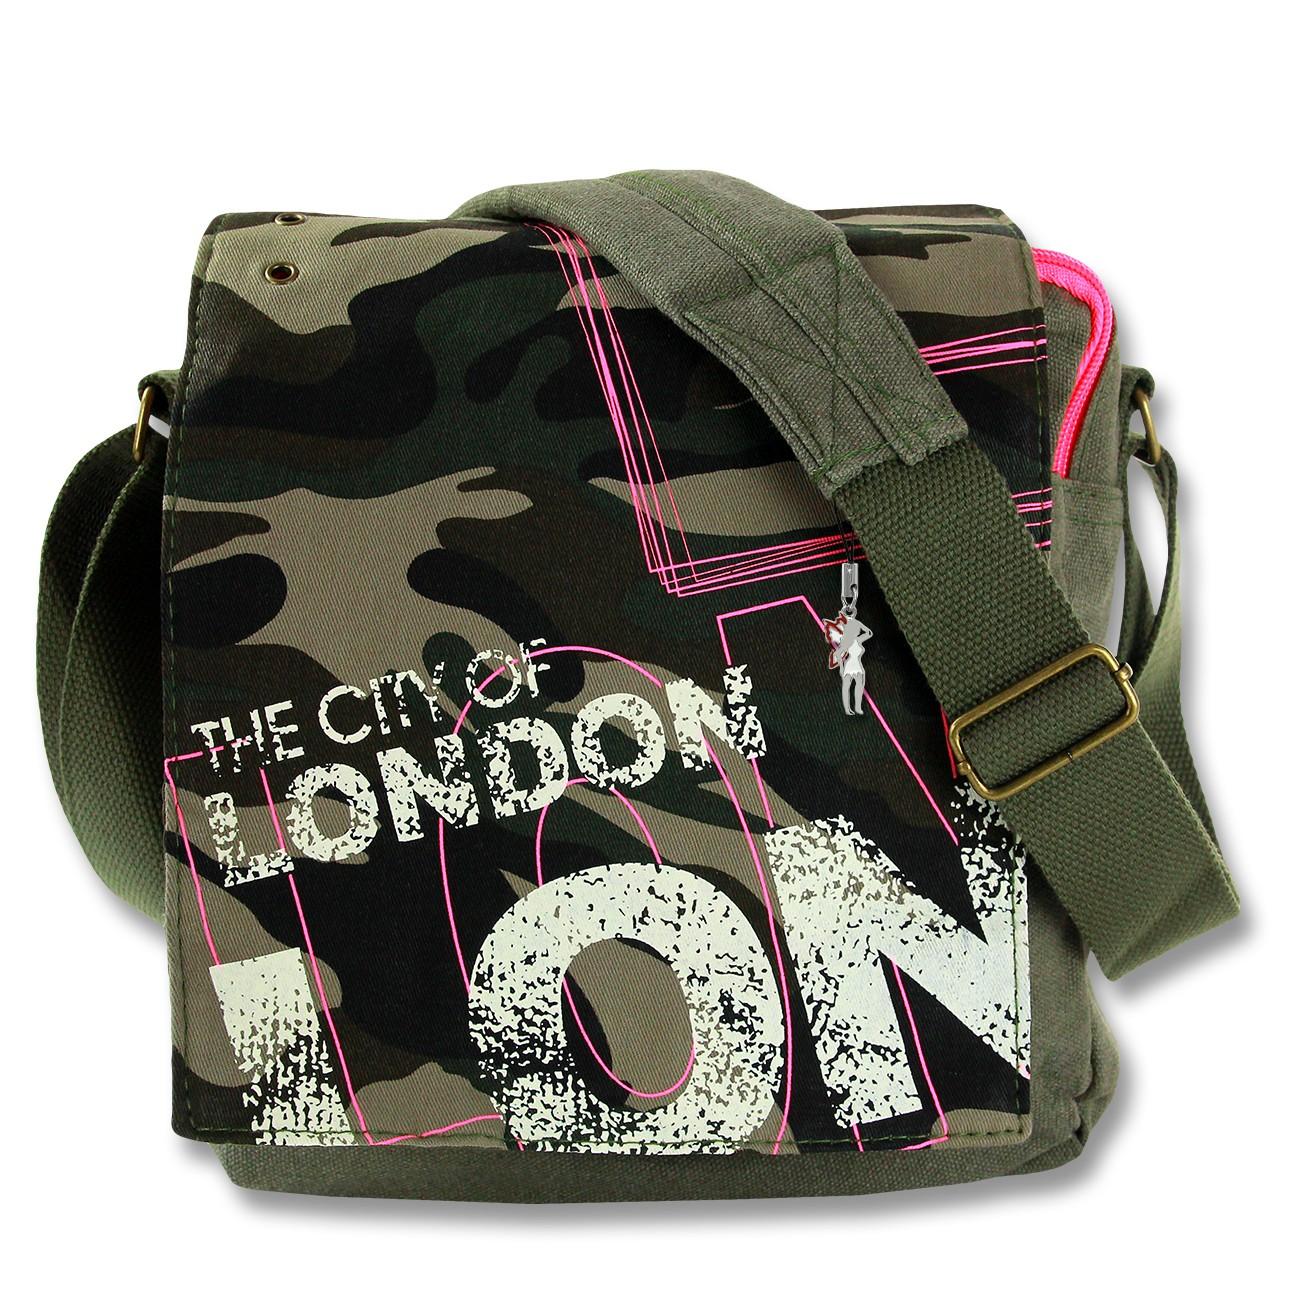 Umhängetasche Canvas grau LONDON CITY Crossover Messenger Robin Ruth OTG202E